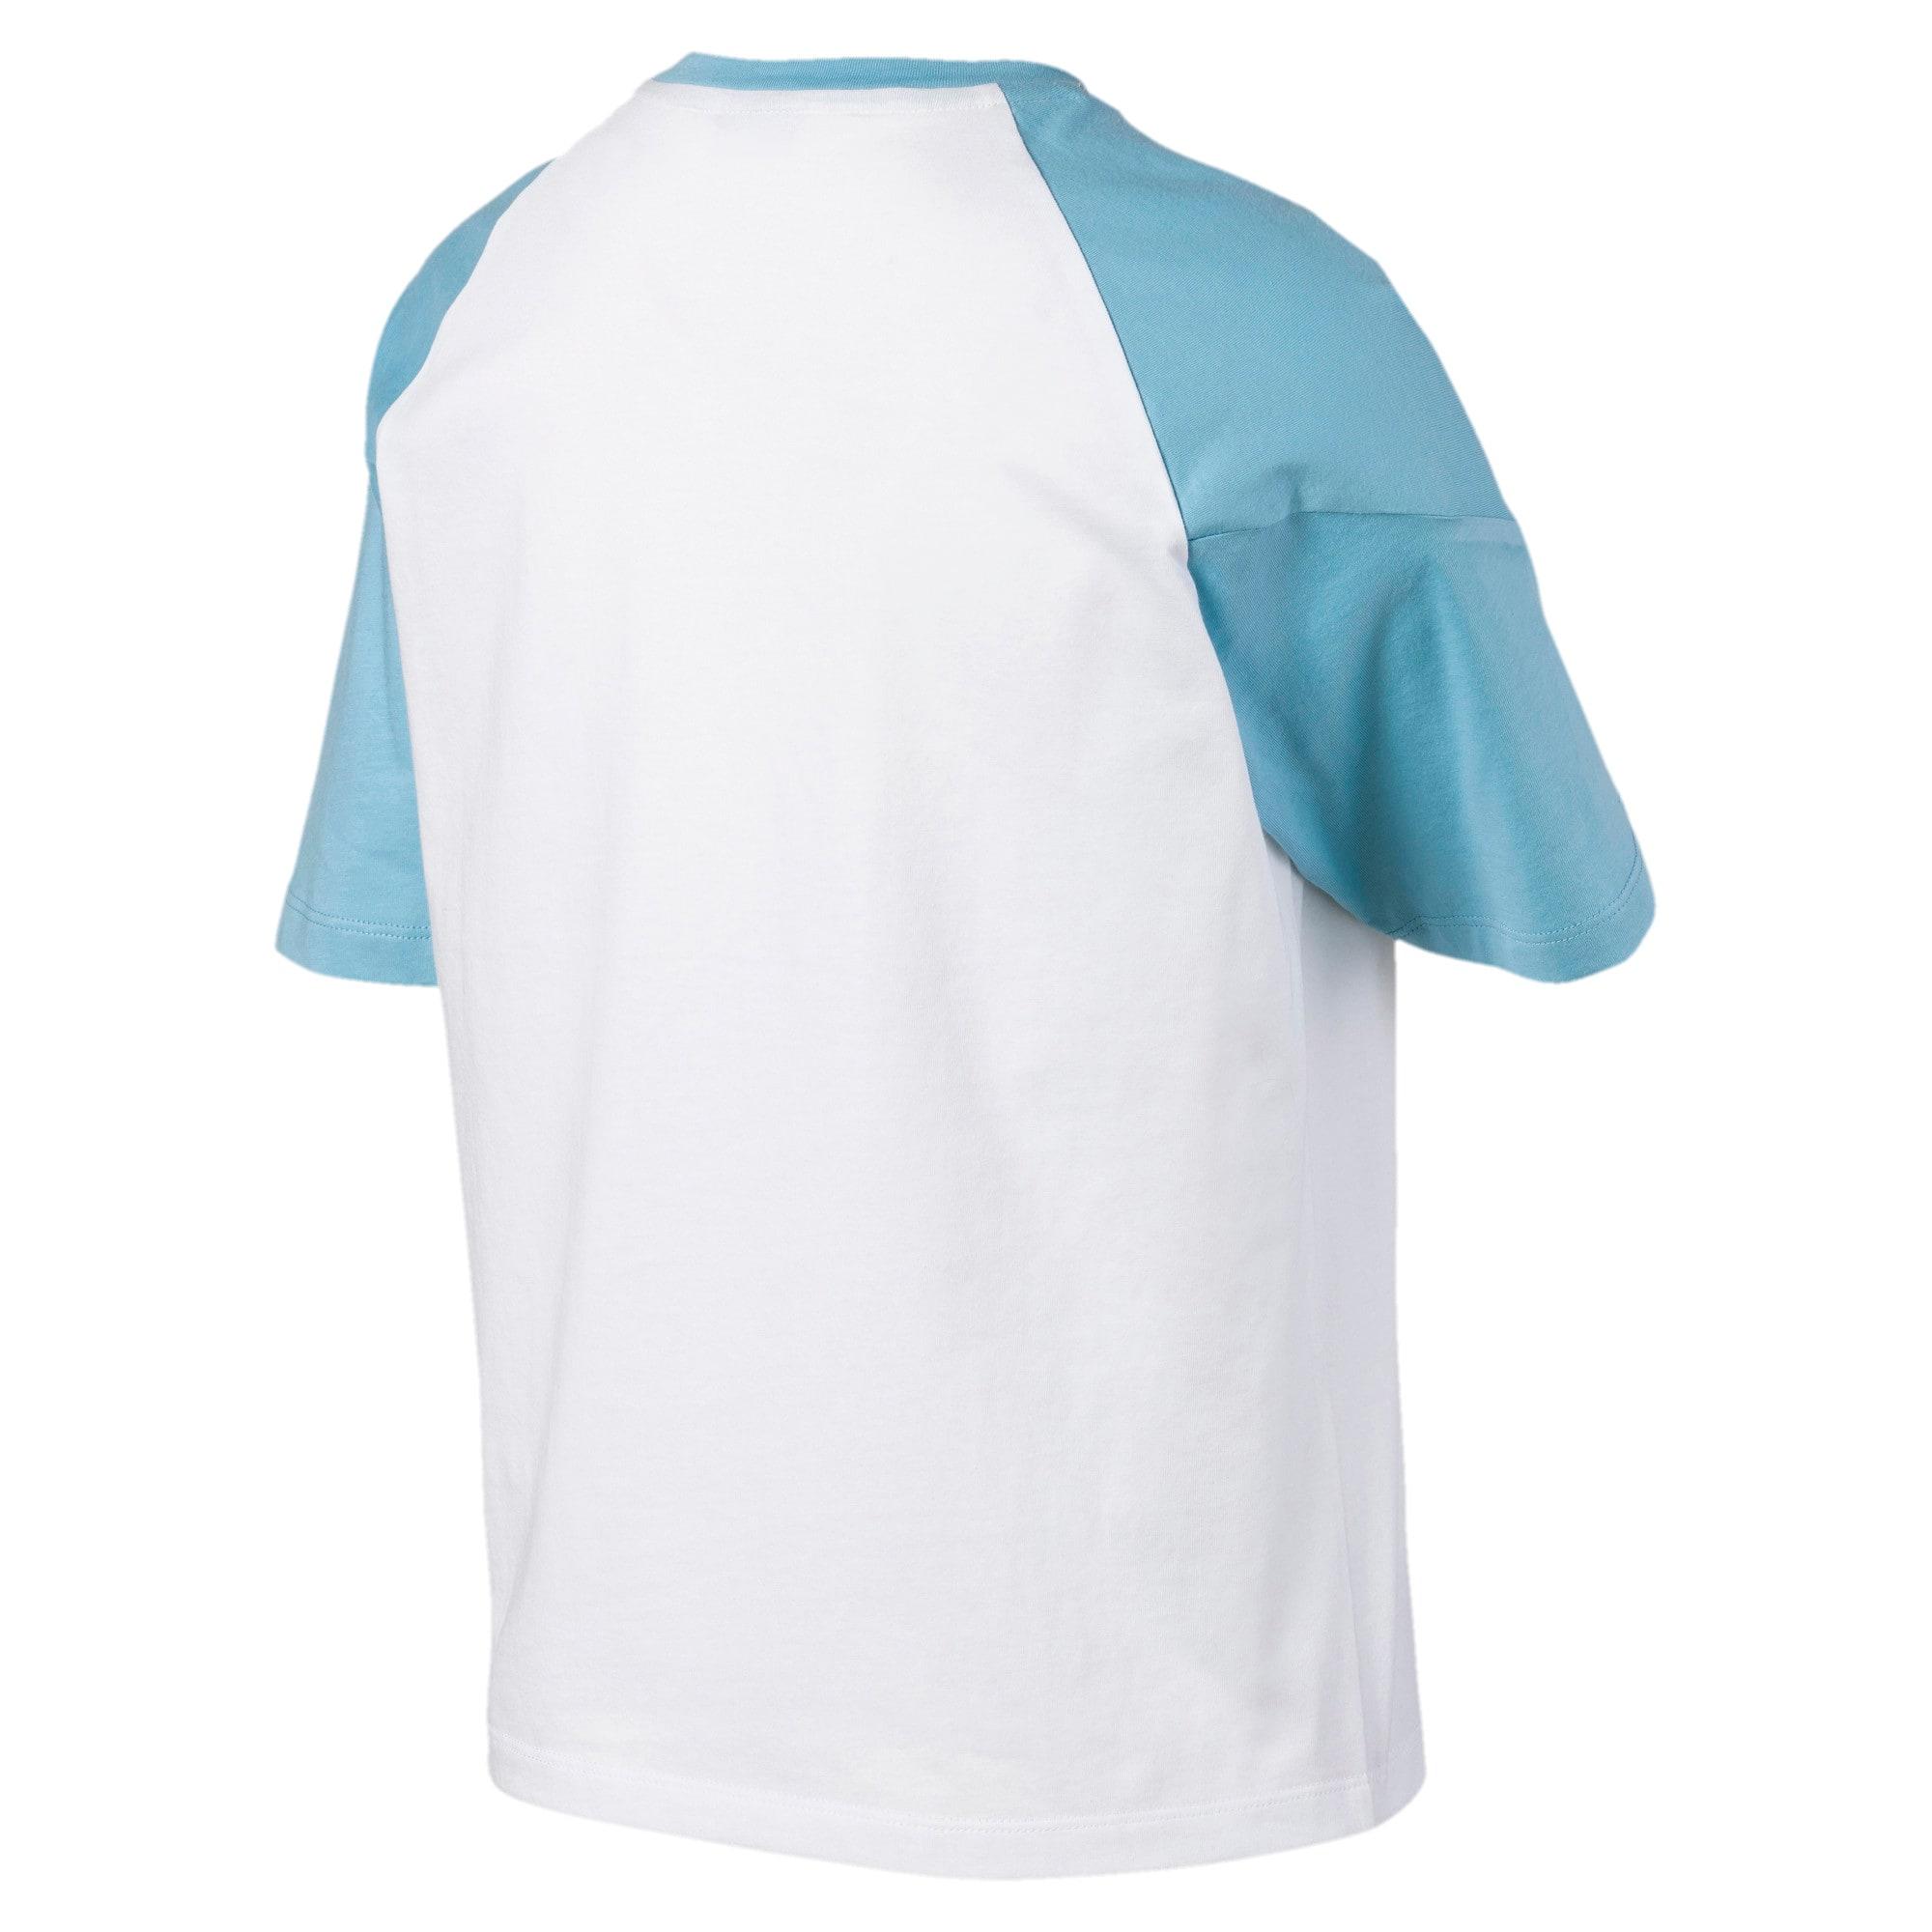 Miniatura 5 de Camiseta PUMA XTG en colores combinados para mujer, Puma White, mediano